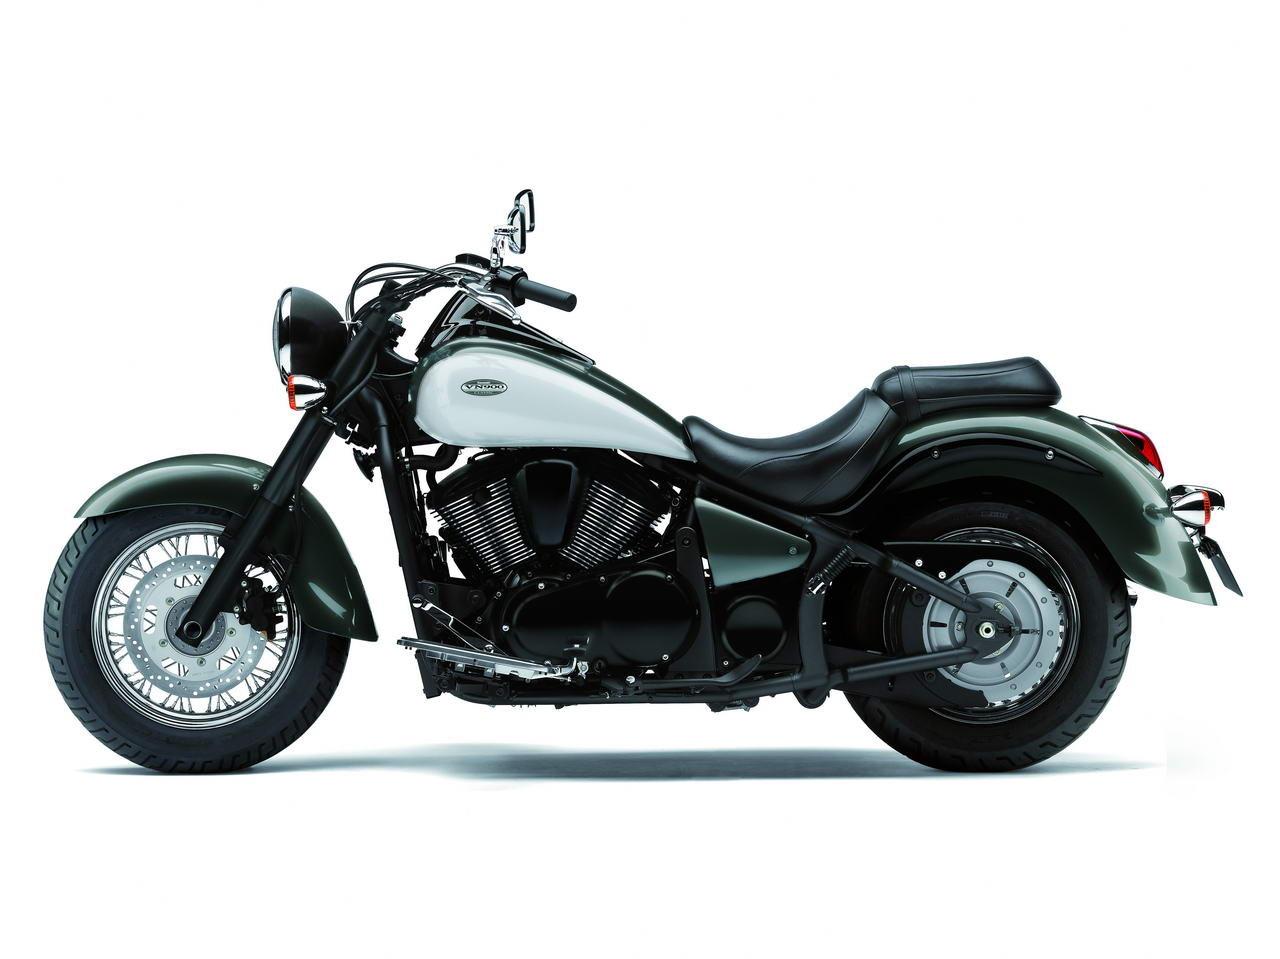 Listino Kawasaki VN 900 Classic Special Custom e Cruiser - image 15541_kawasaki-vn900-custom on http://moto.motori.net